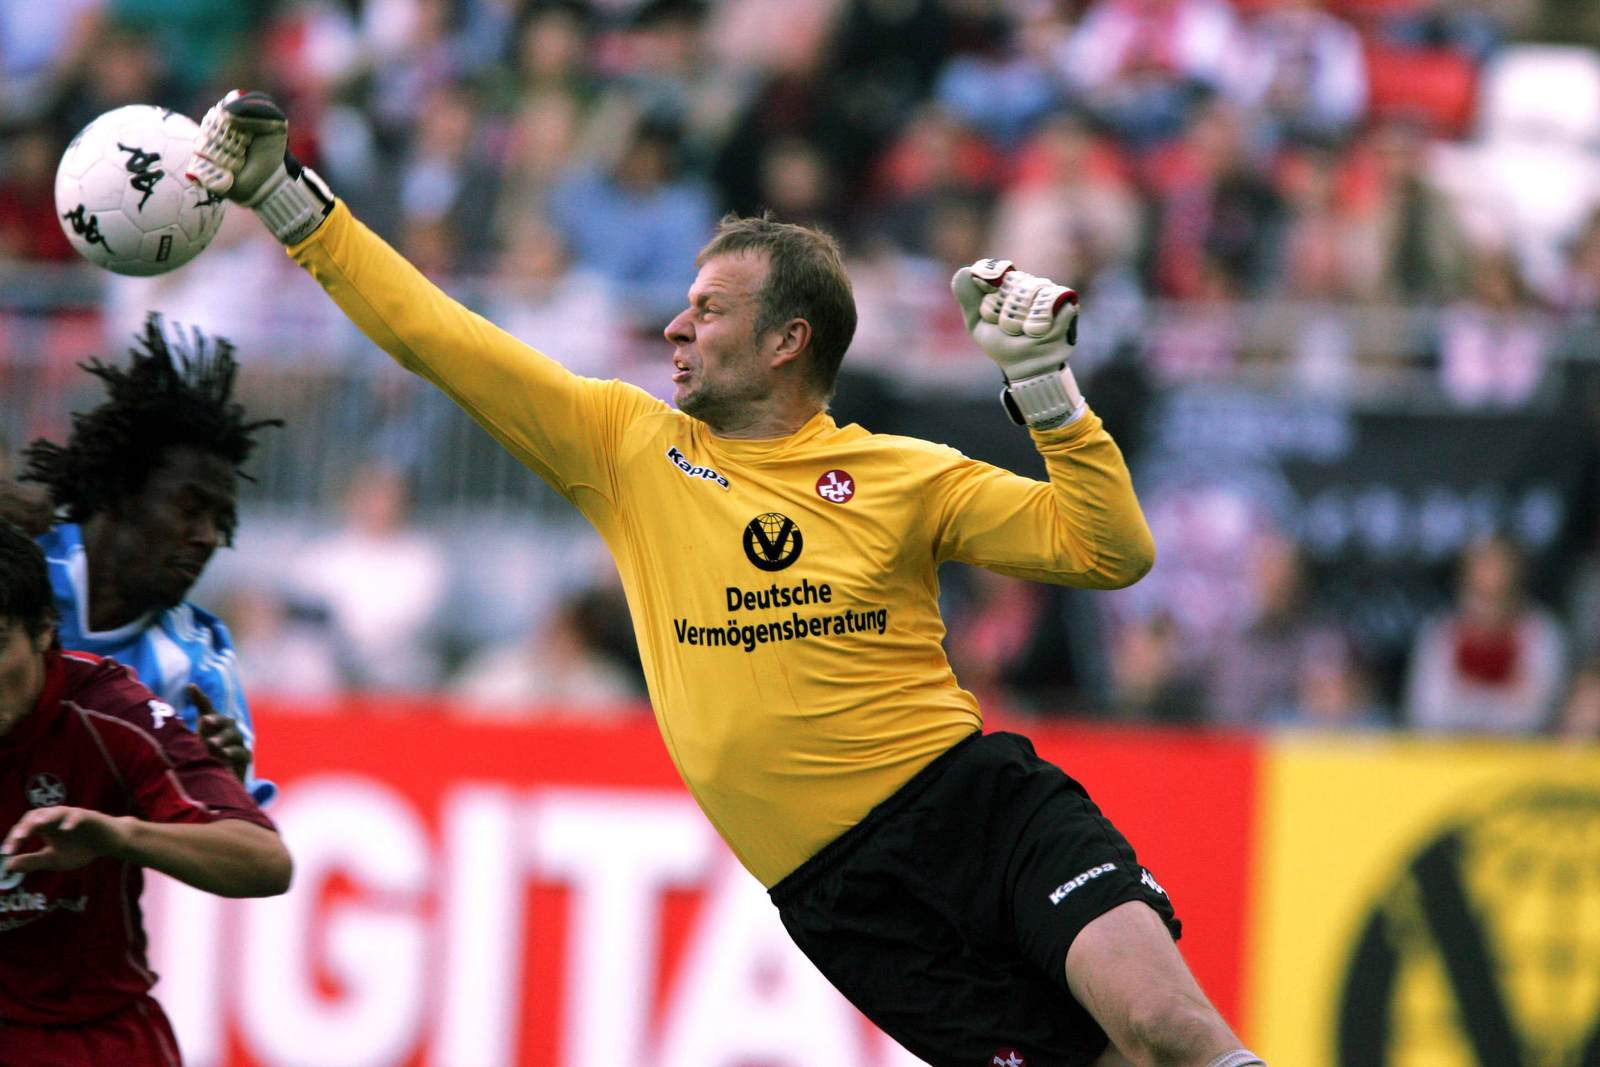 Thomas Ernst im Trikot des 1. FC Kaiserslautern